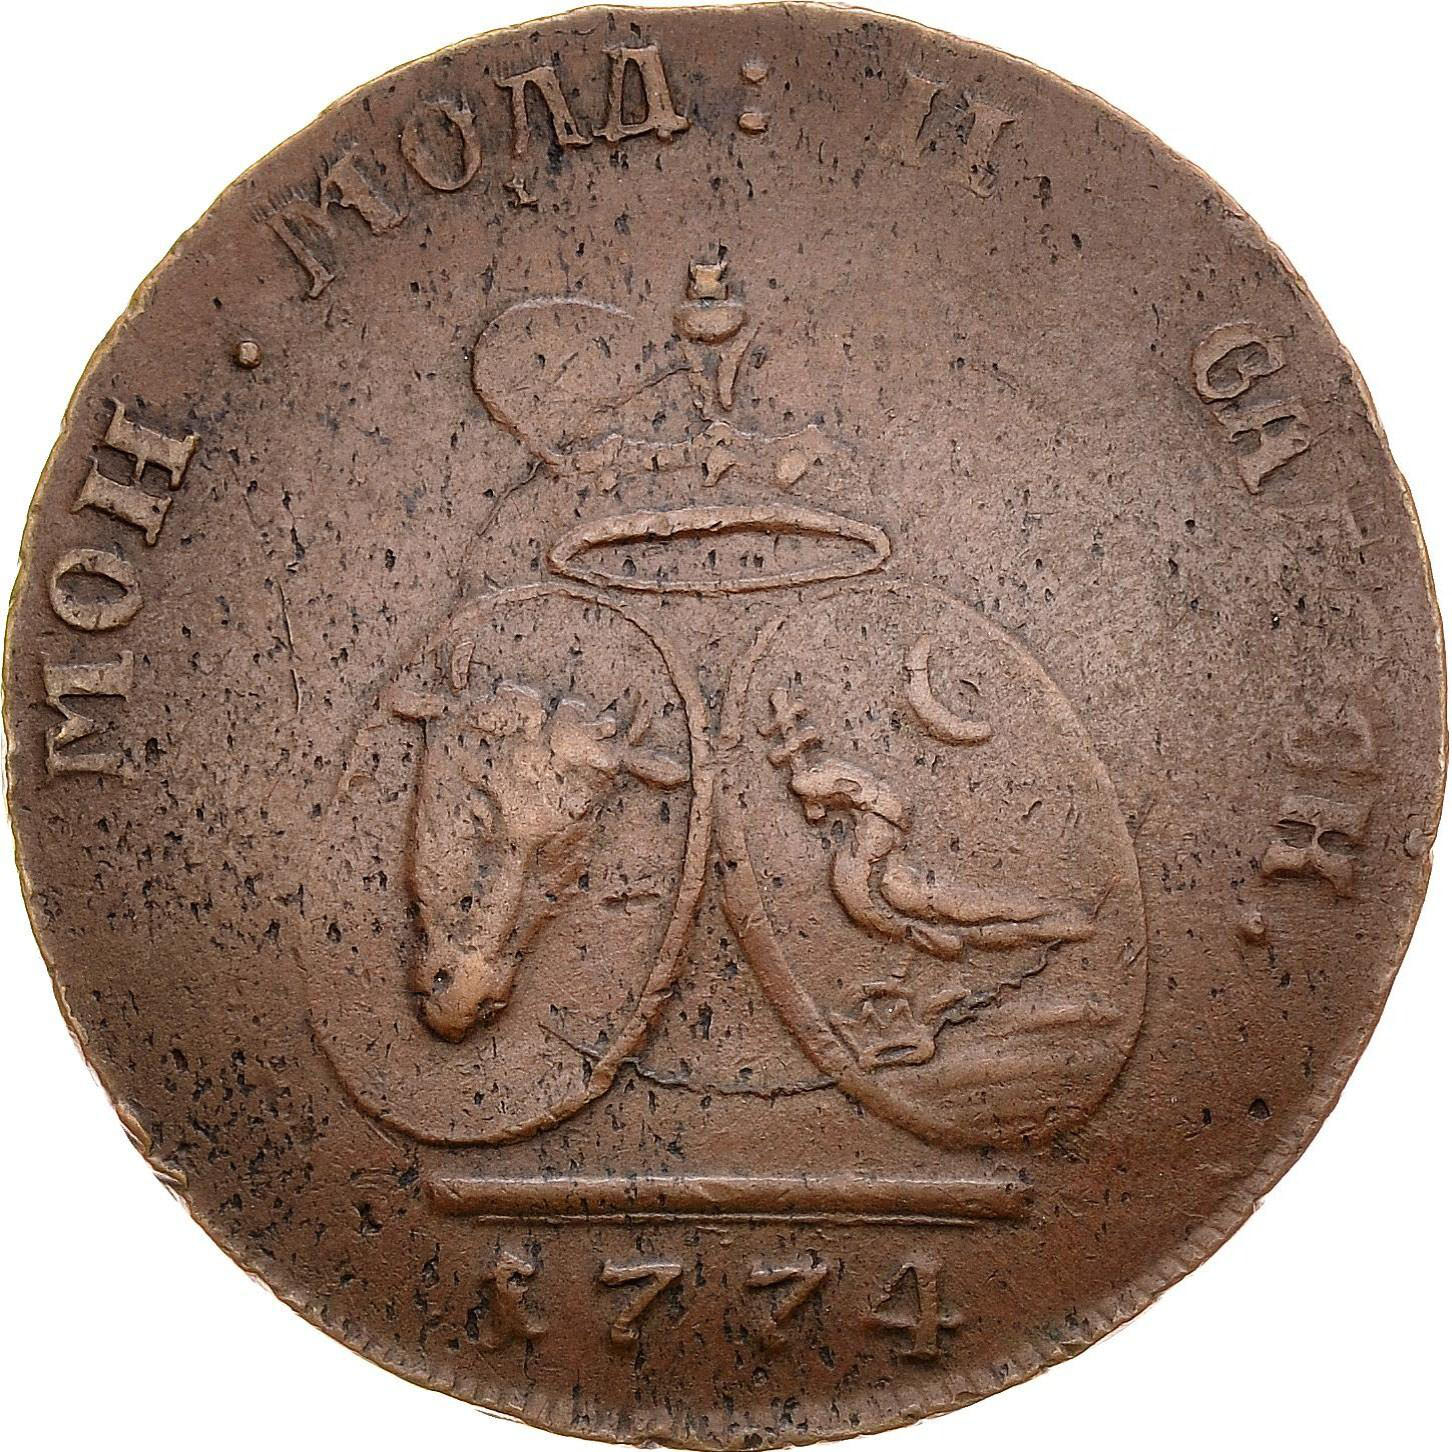 2 пара - 3 копейки 1774 г. Для Молдавии и Валахии (Екатерина II).